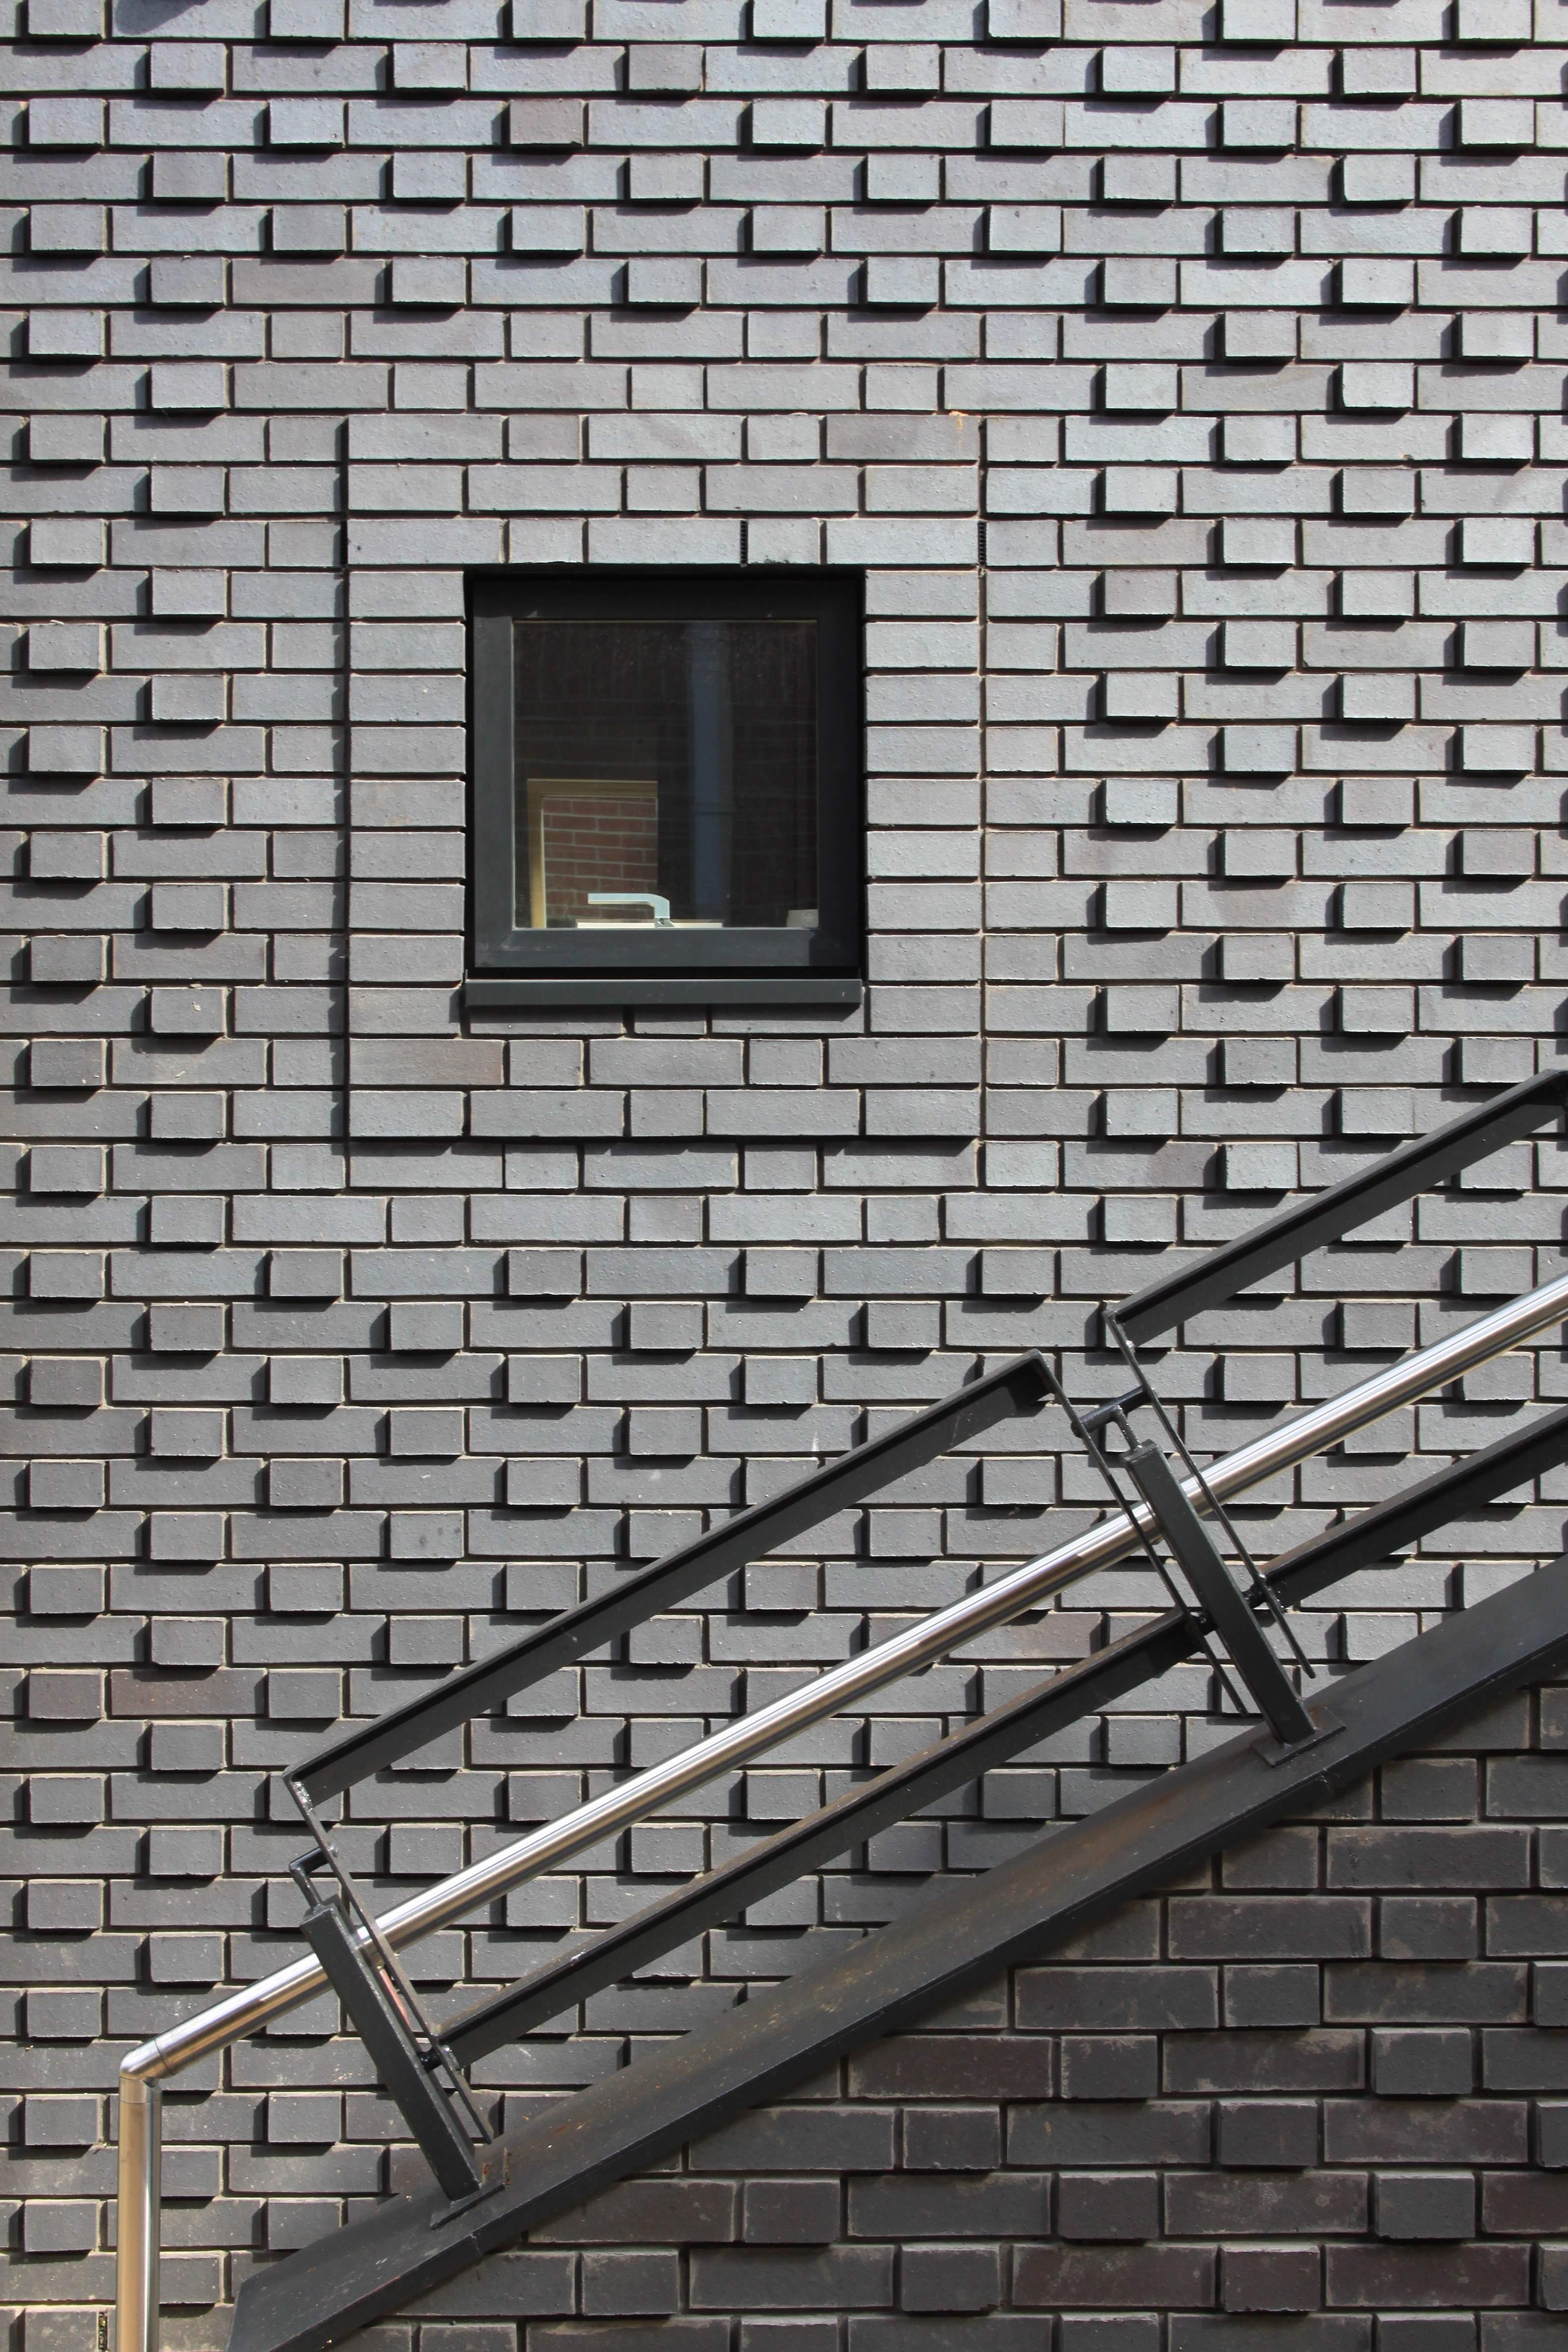 CUD02 Brickwork-1